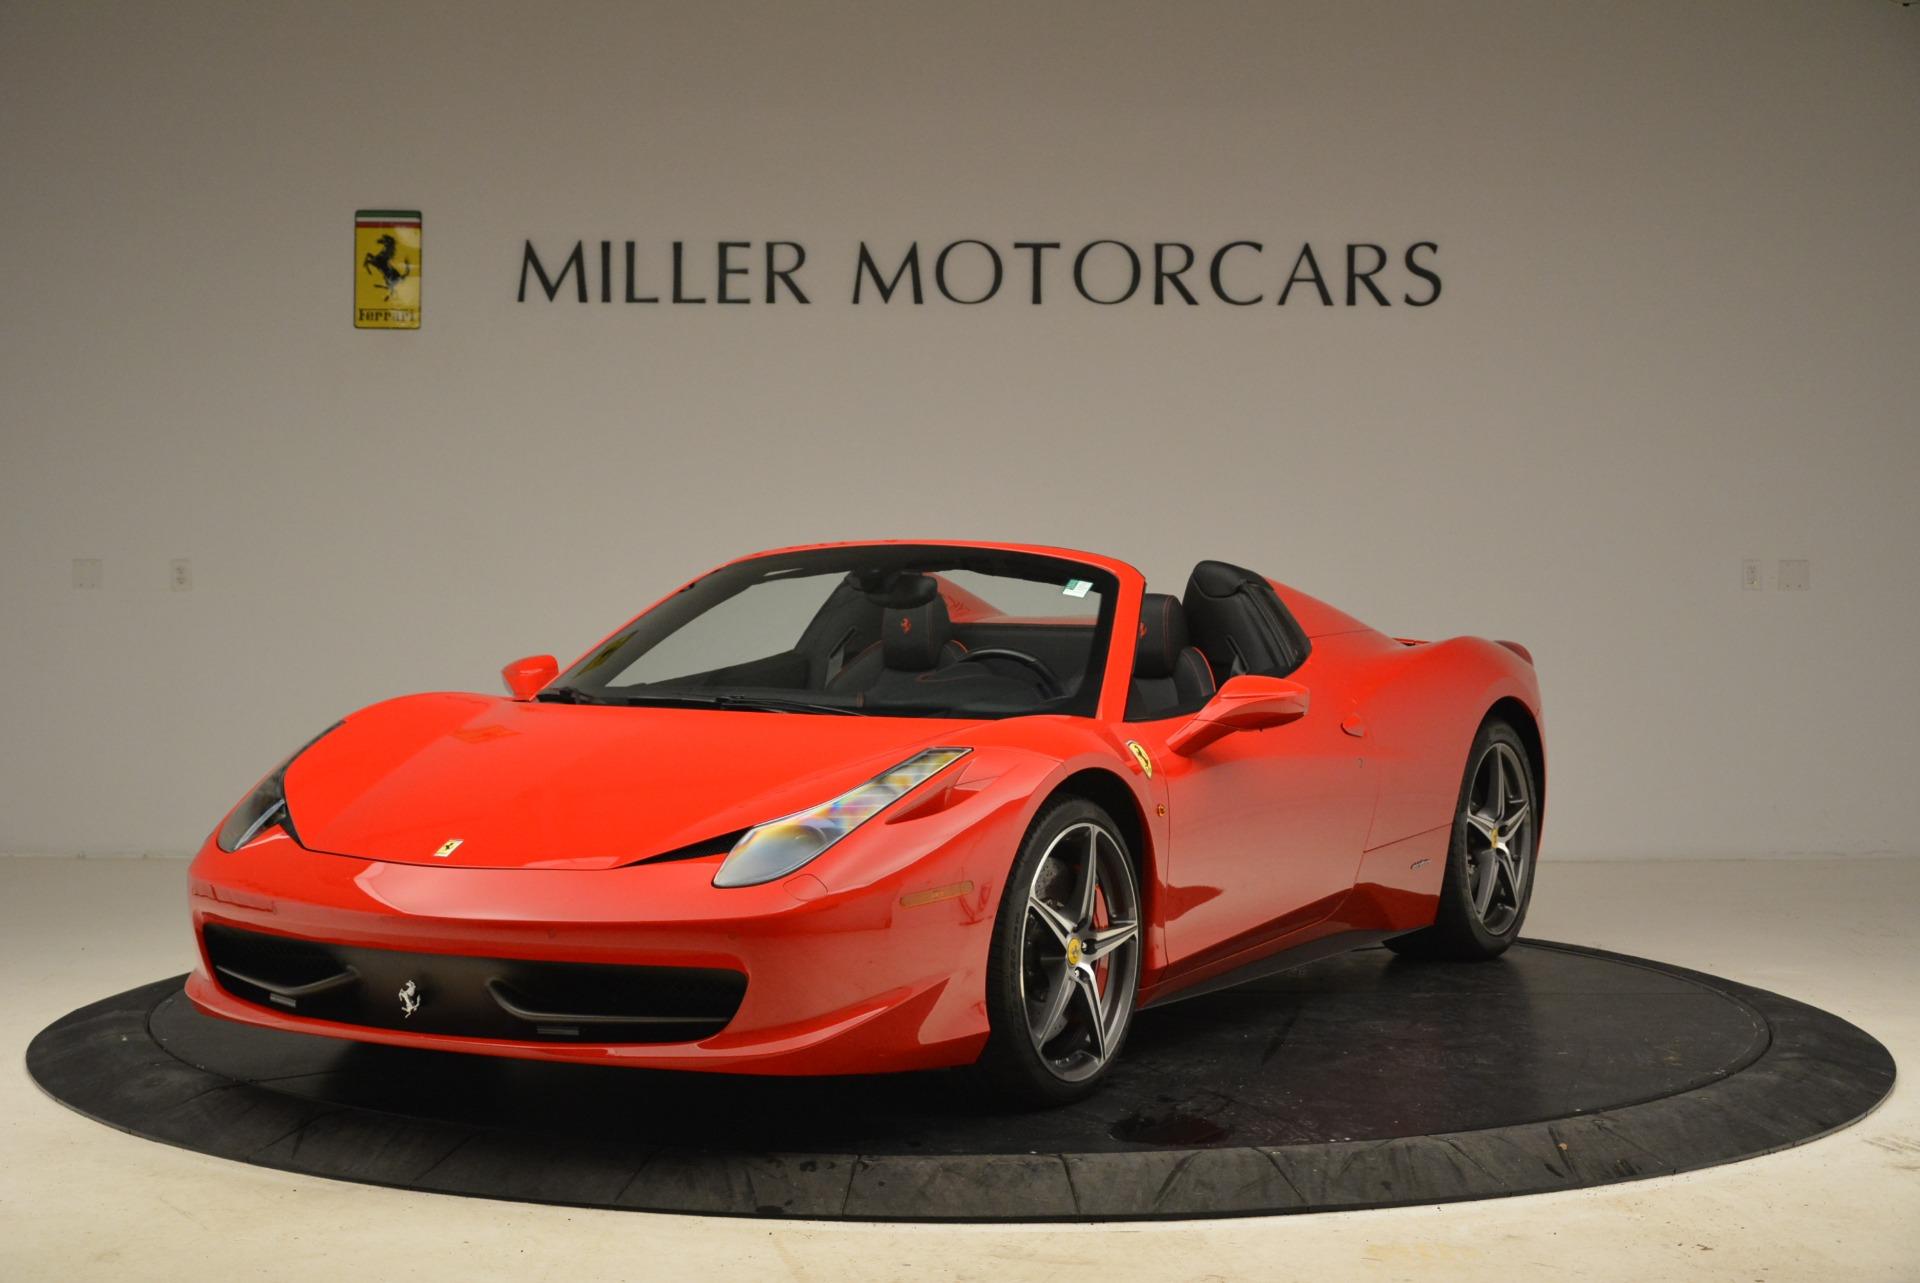 2014 Ferrari 458 Spider >> Used 2014 Ferrari 458 Spider For Sale 229 900 Miller